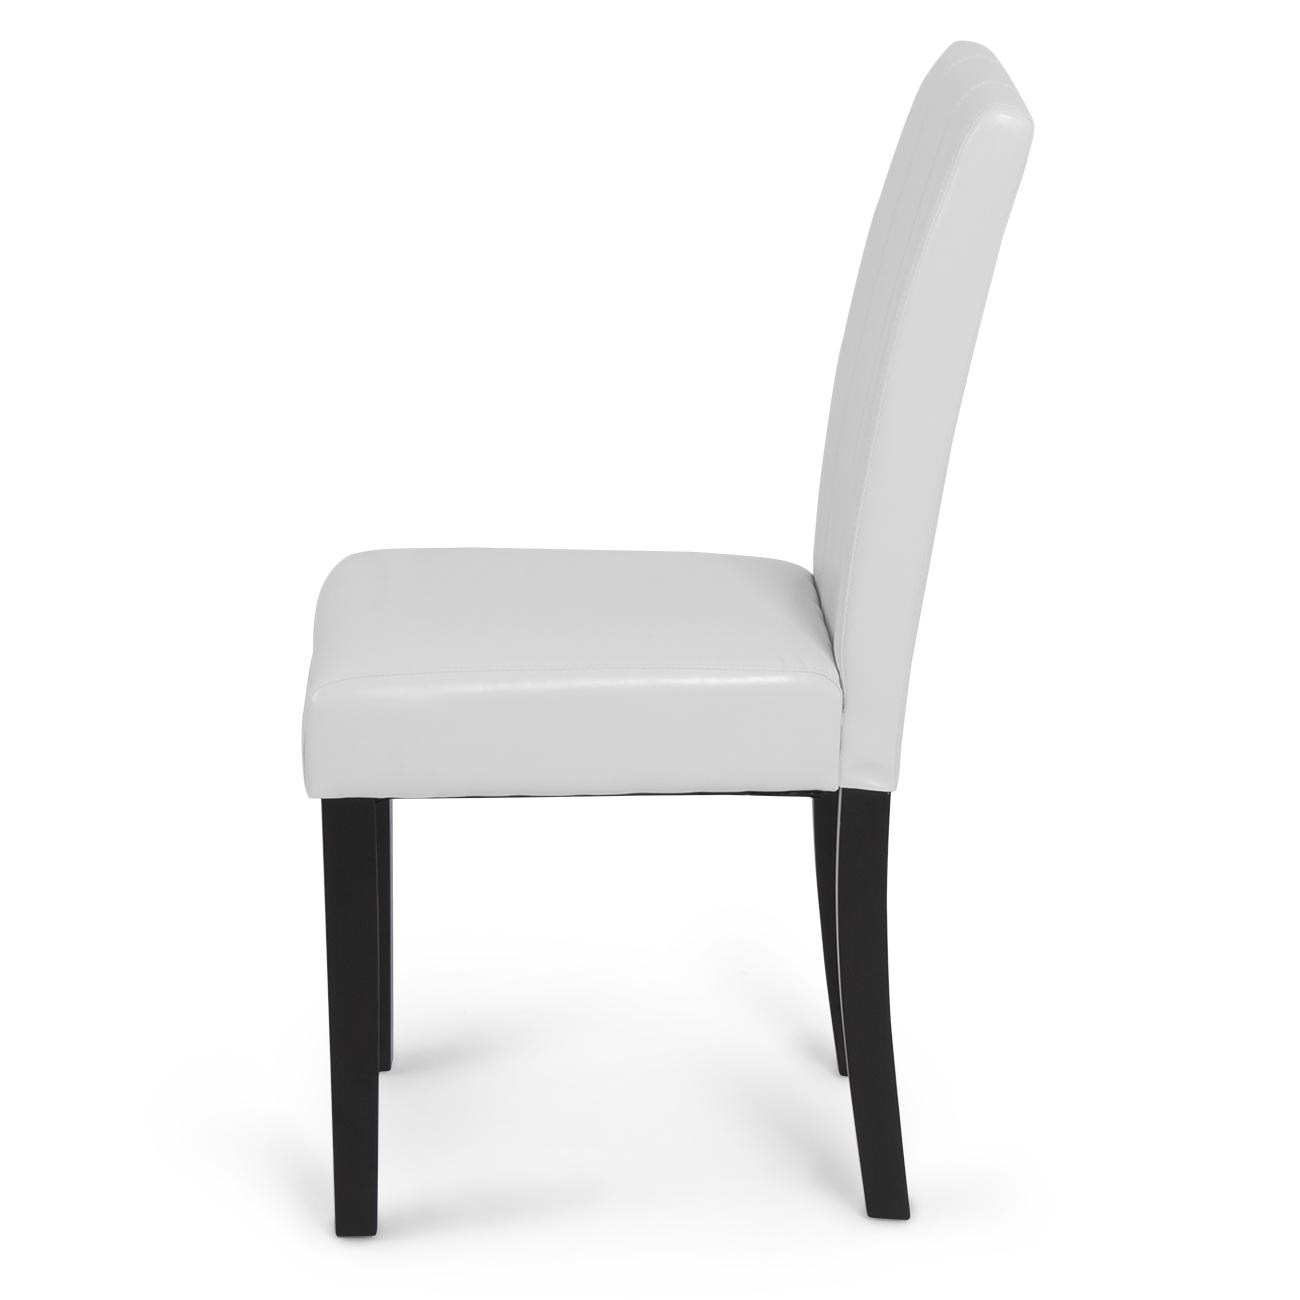 Set of 2 Elegant Modern Design Leather Parsons Dining  : 014 hg 30300 wh2 from www.ebay.com size 1300 x 1300 jpeg 138kB